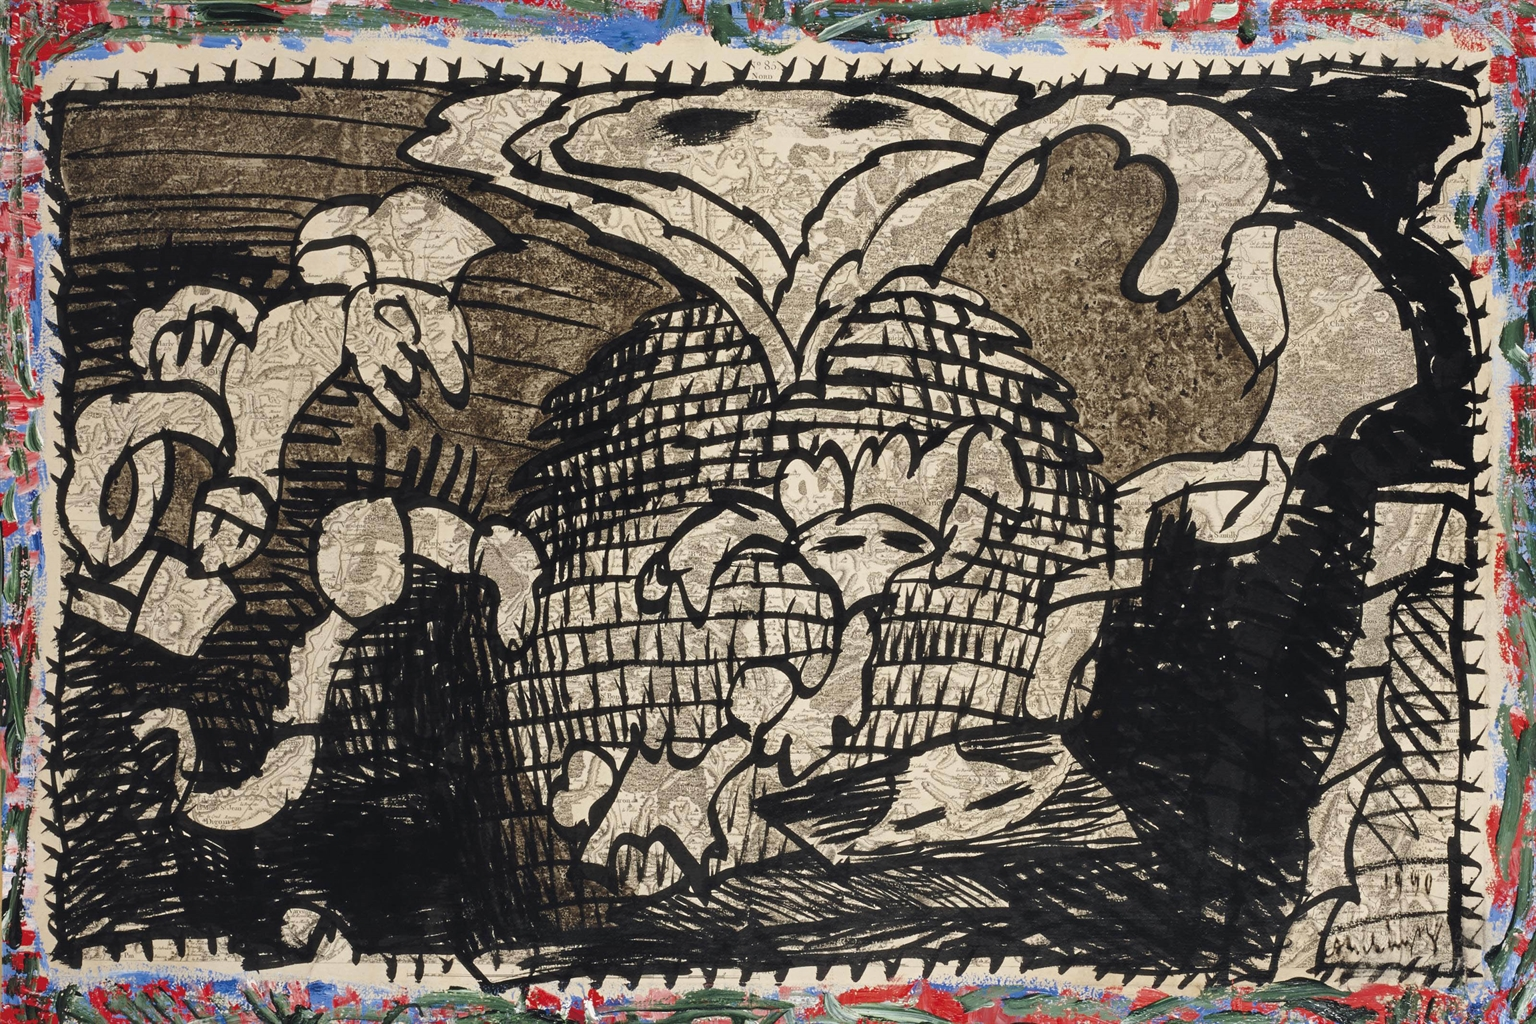 Pierre Alechinsky-La mine de bois-brule-1990